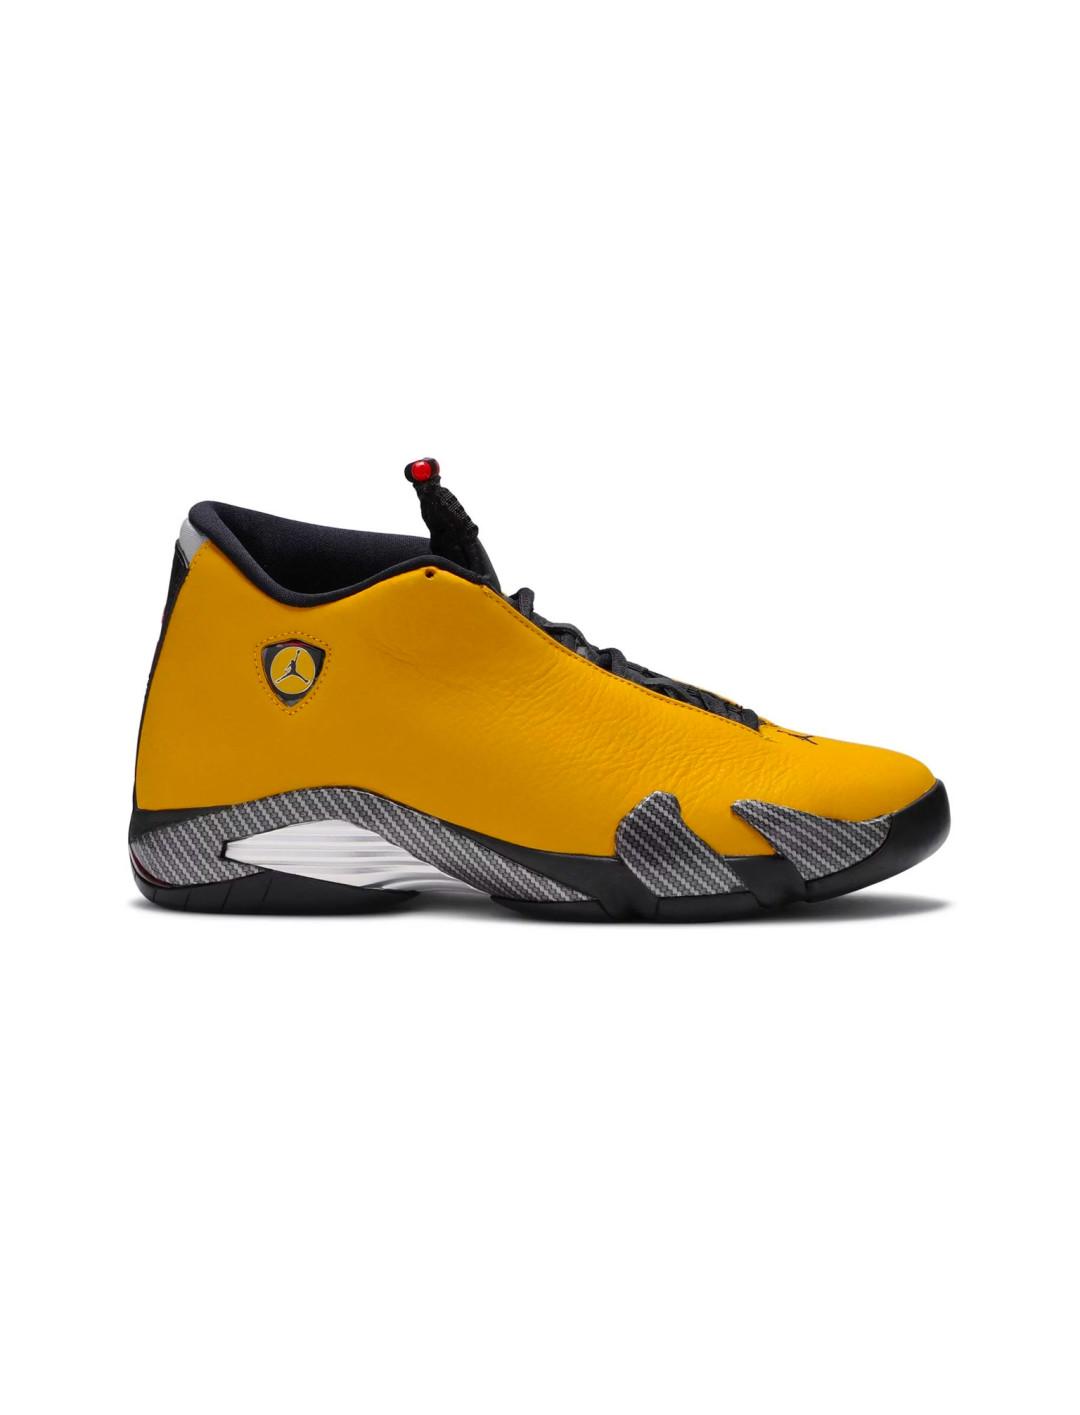 Air Jordan 14 Retro Shoes